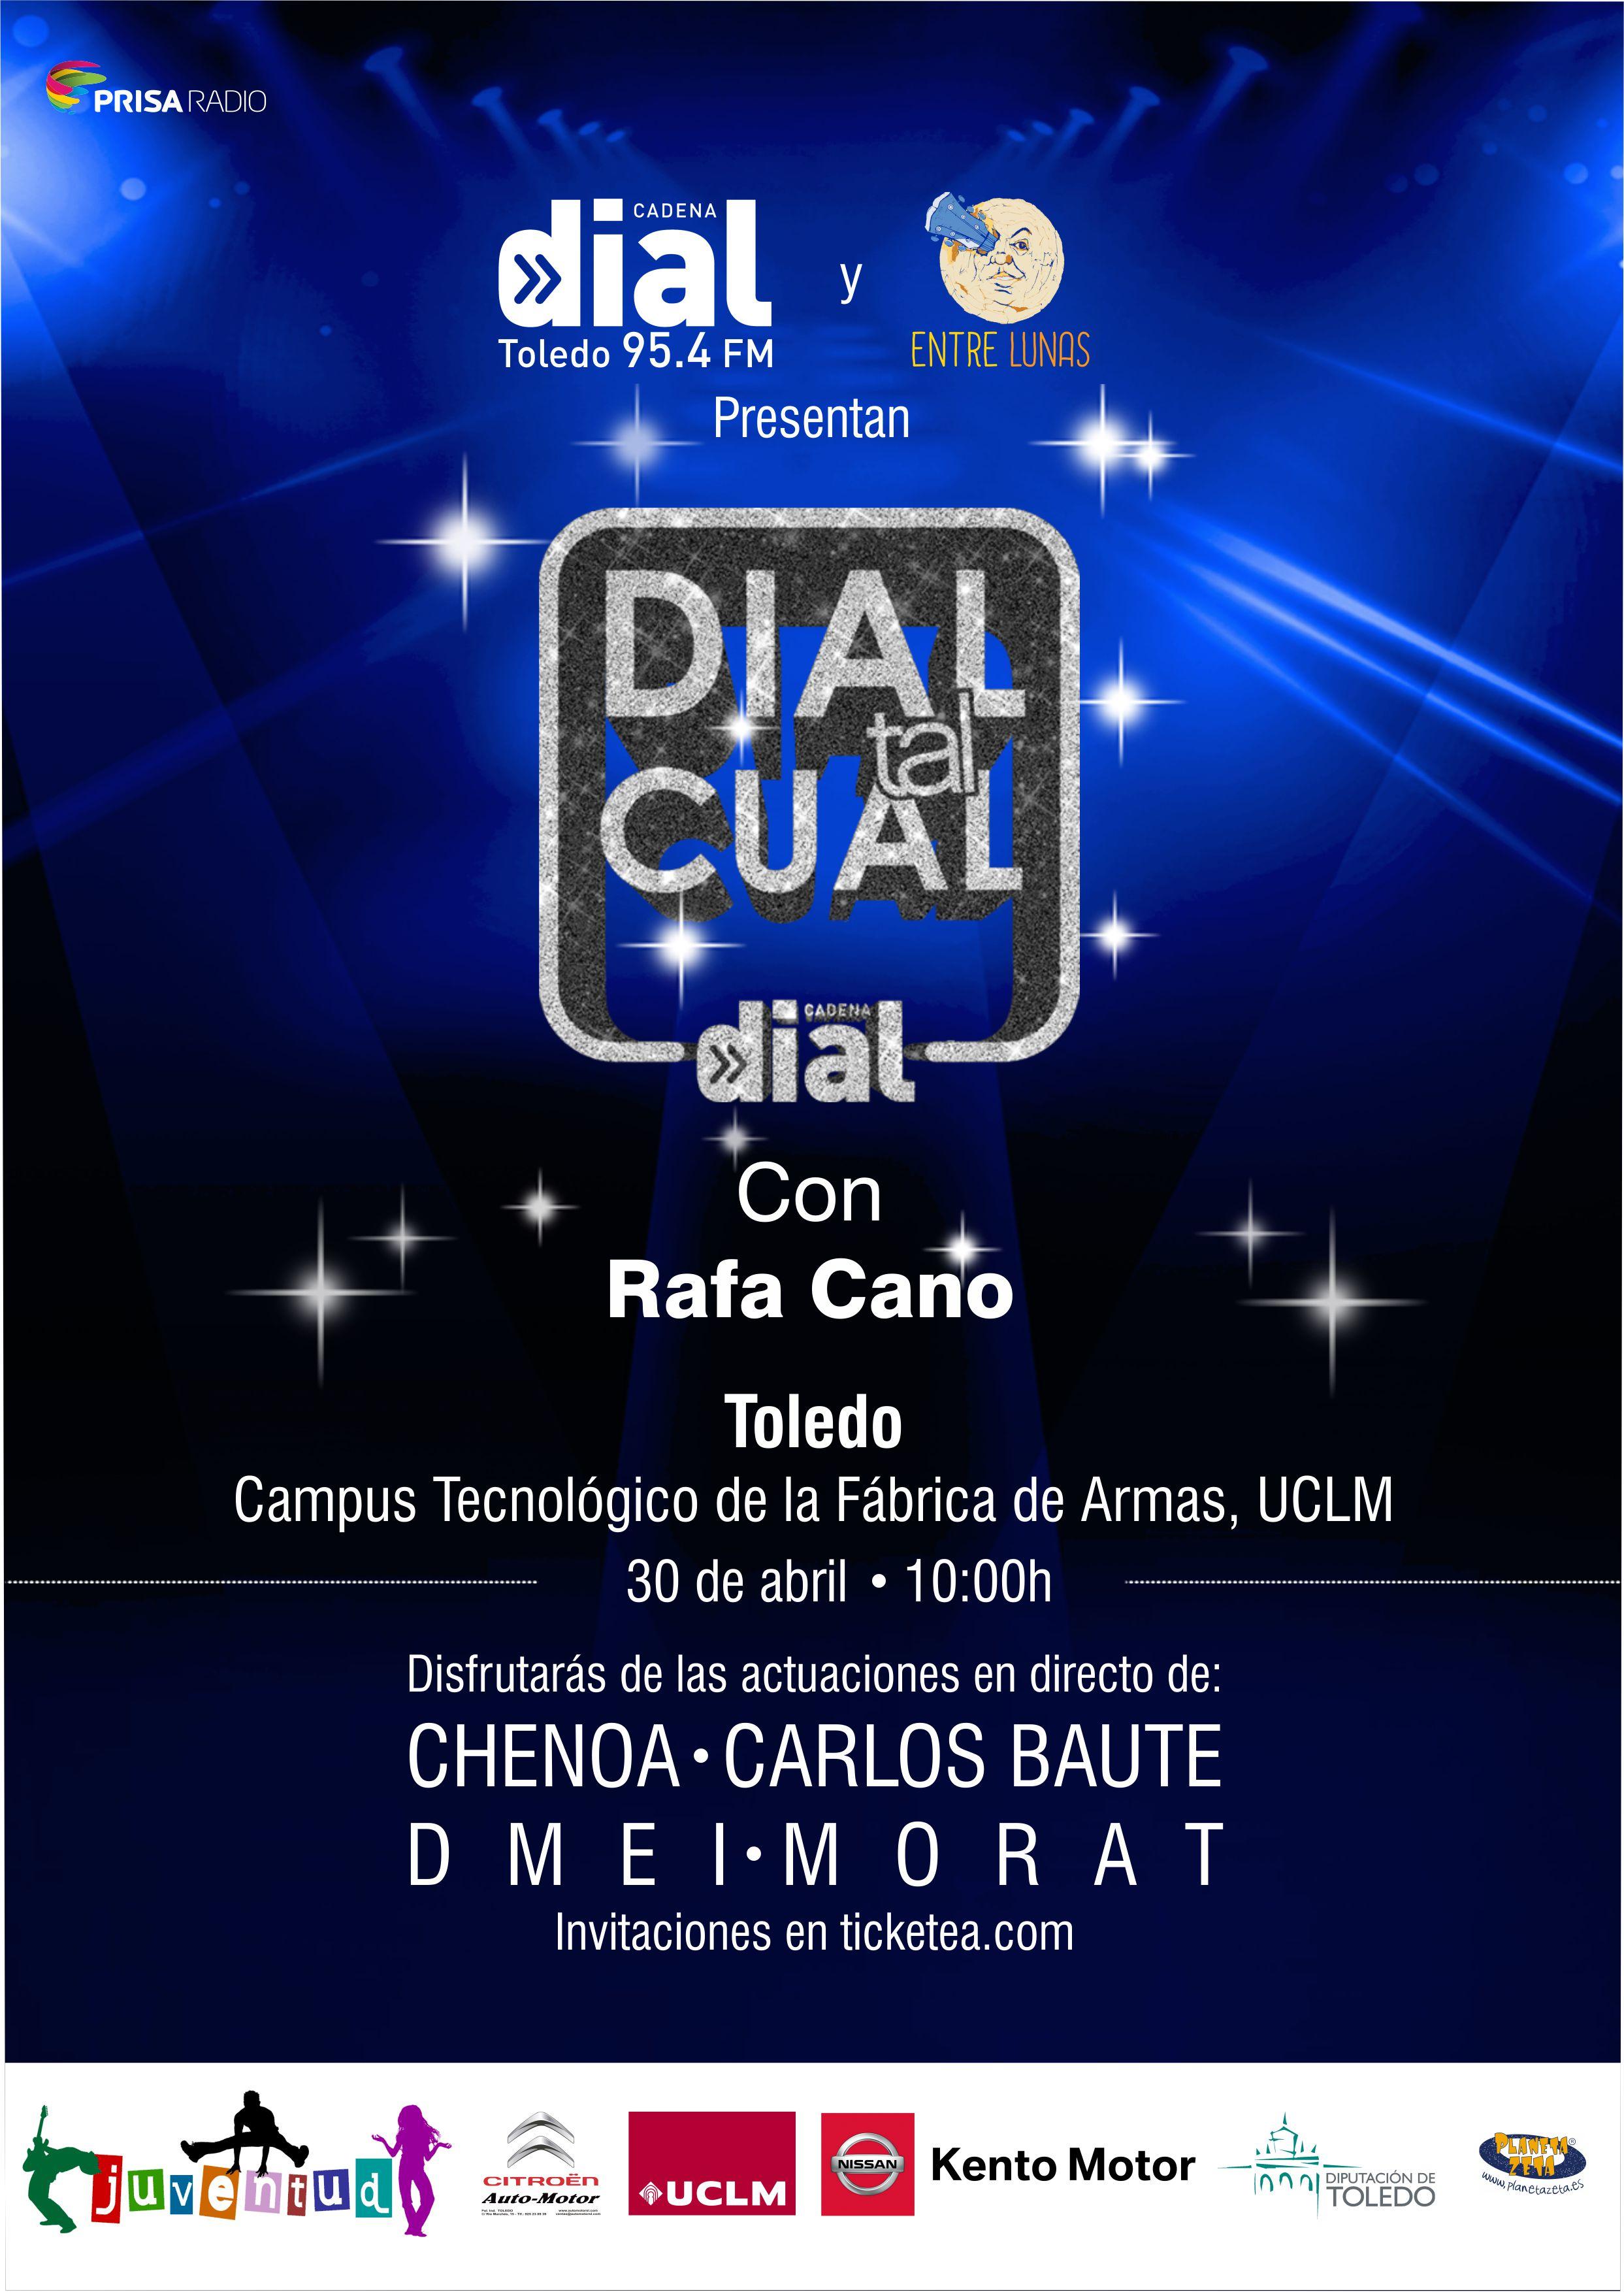 Original Prensa Dial Tal Cual Toledo